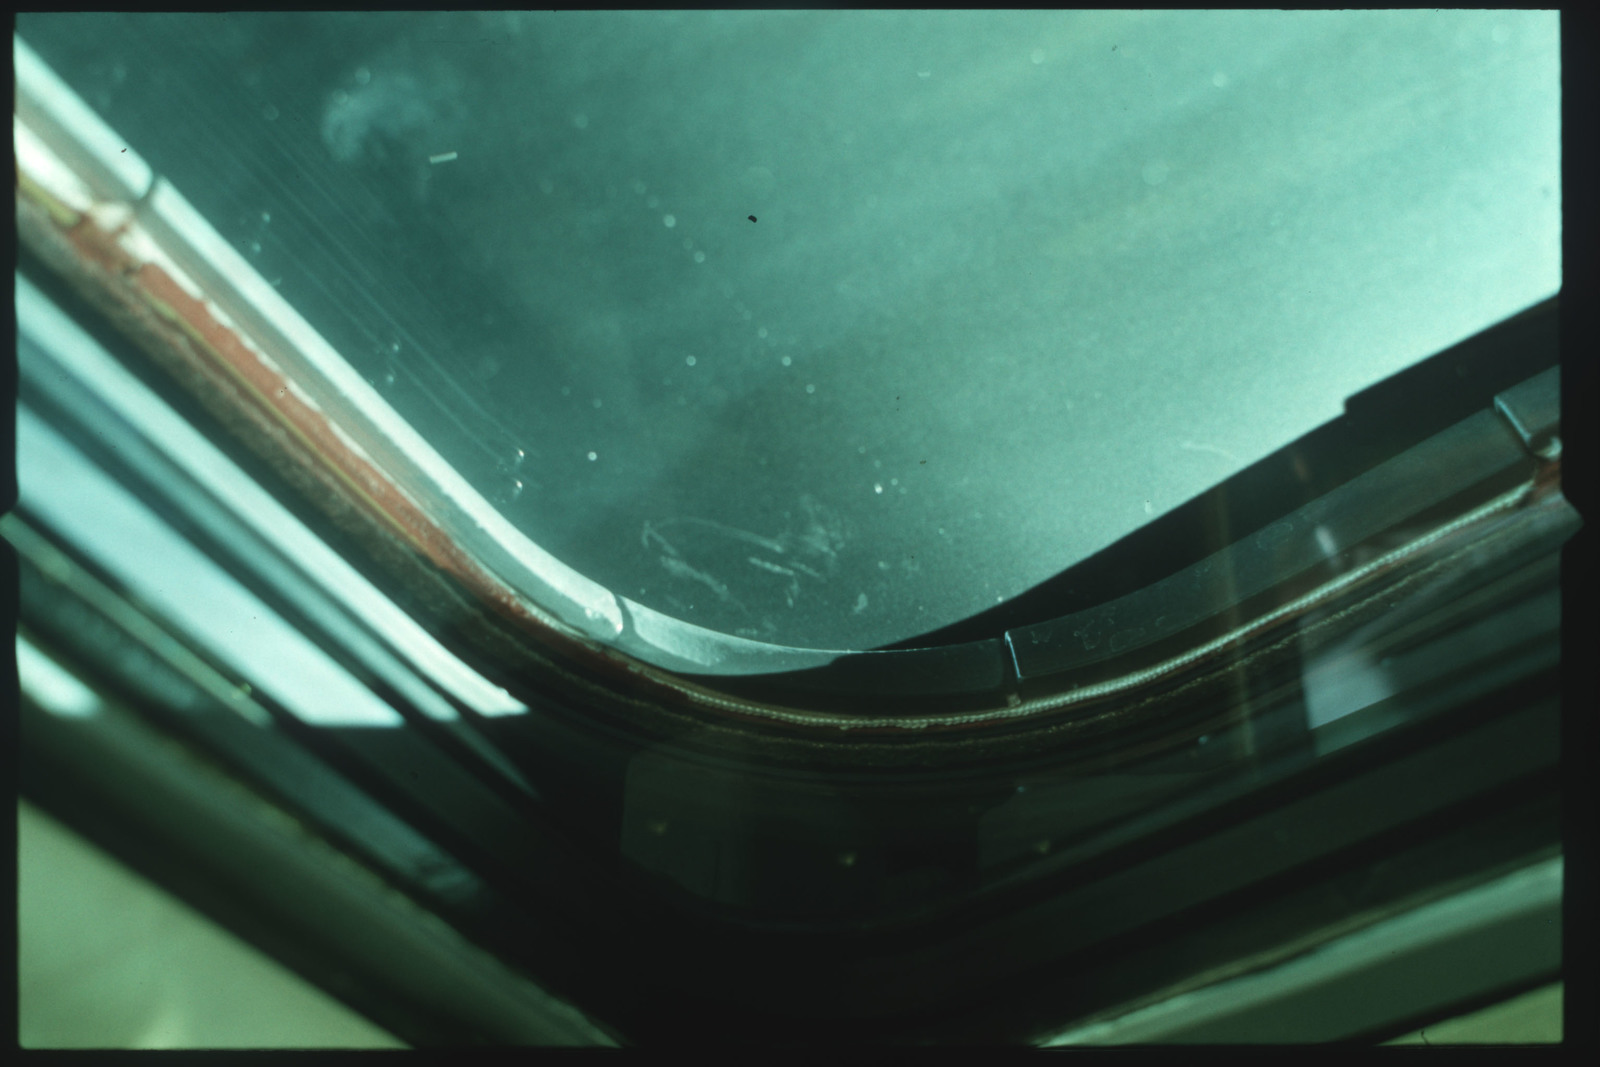 S01-07-507 - STS-001 - Crew compartment flight deck window debris,damage,streak documentation